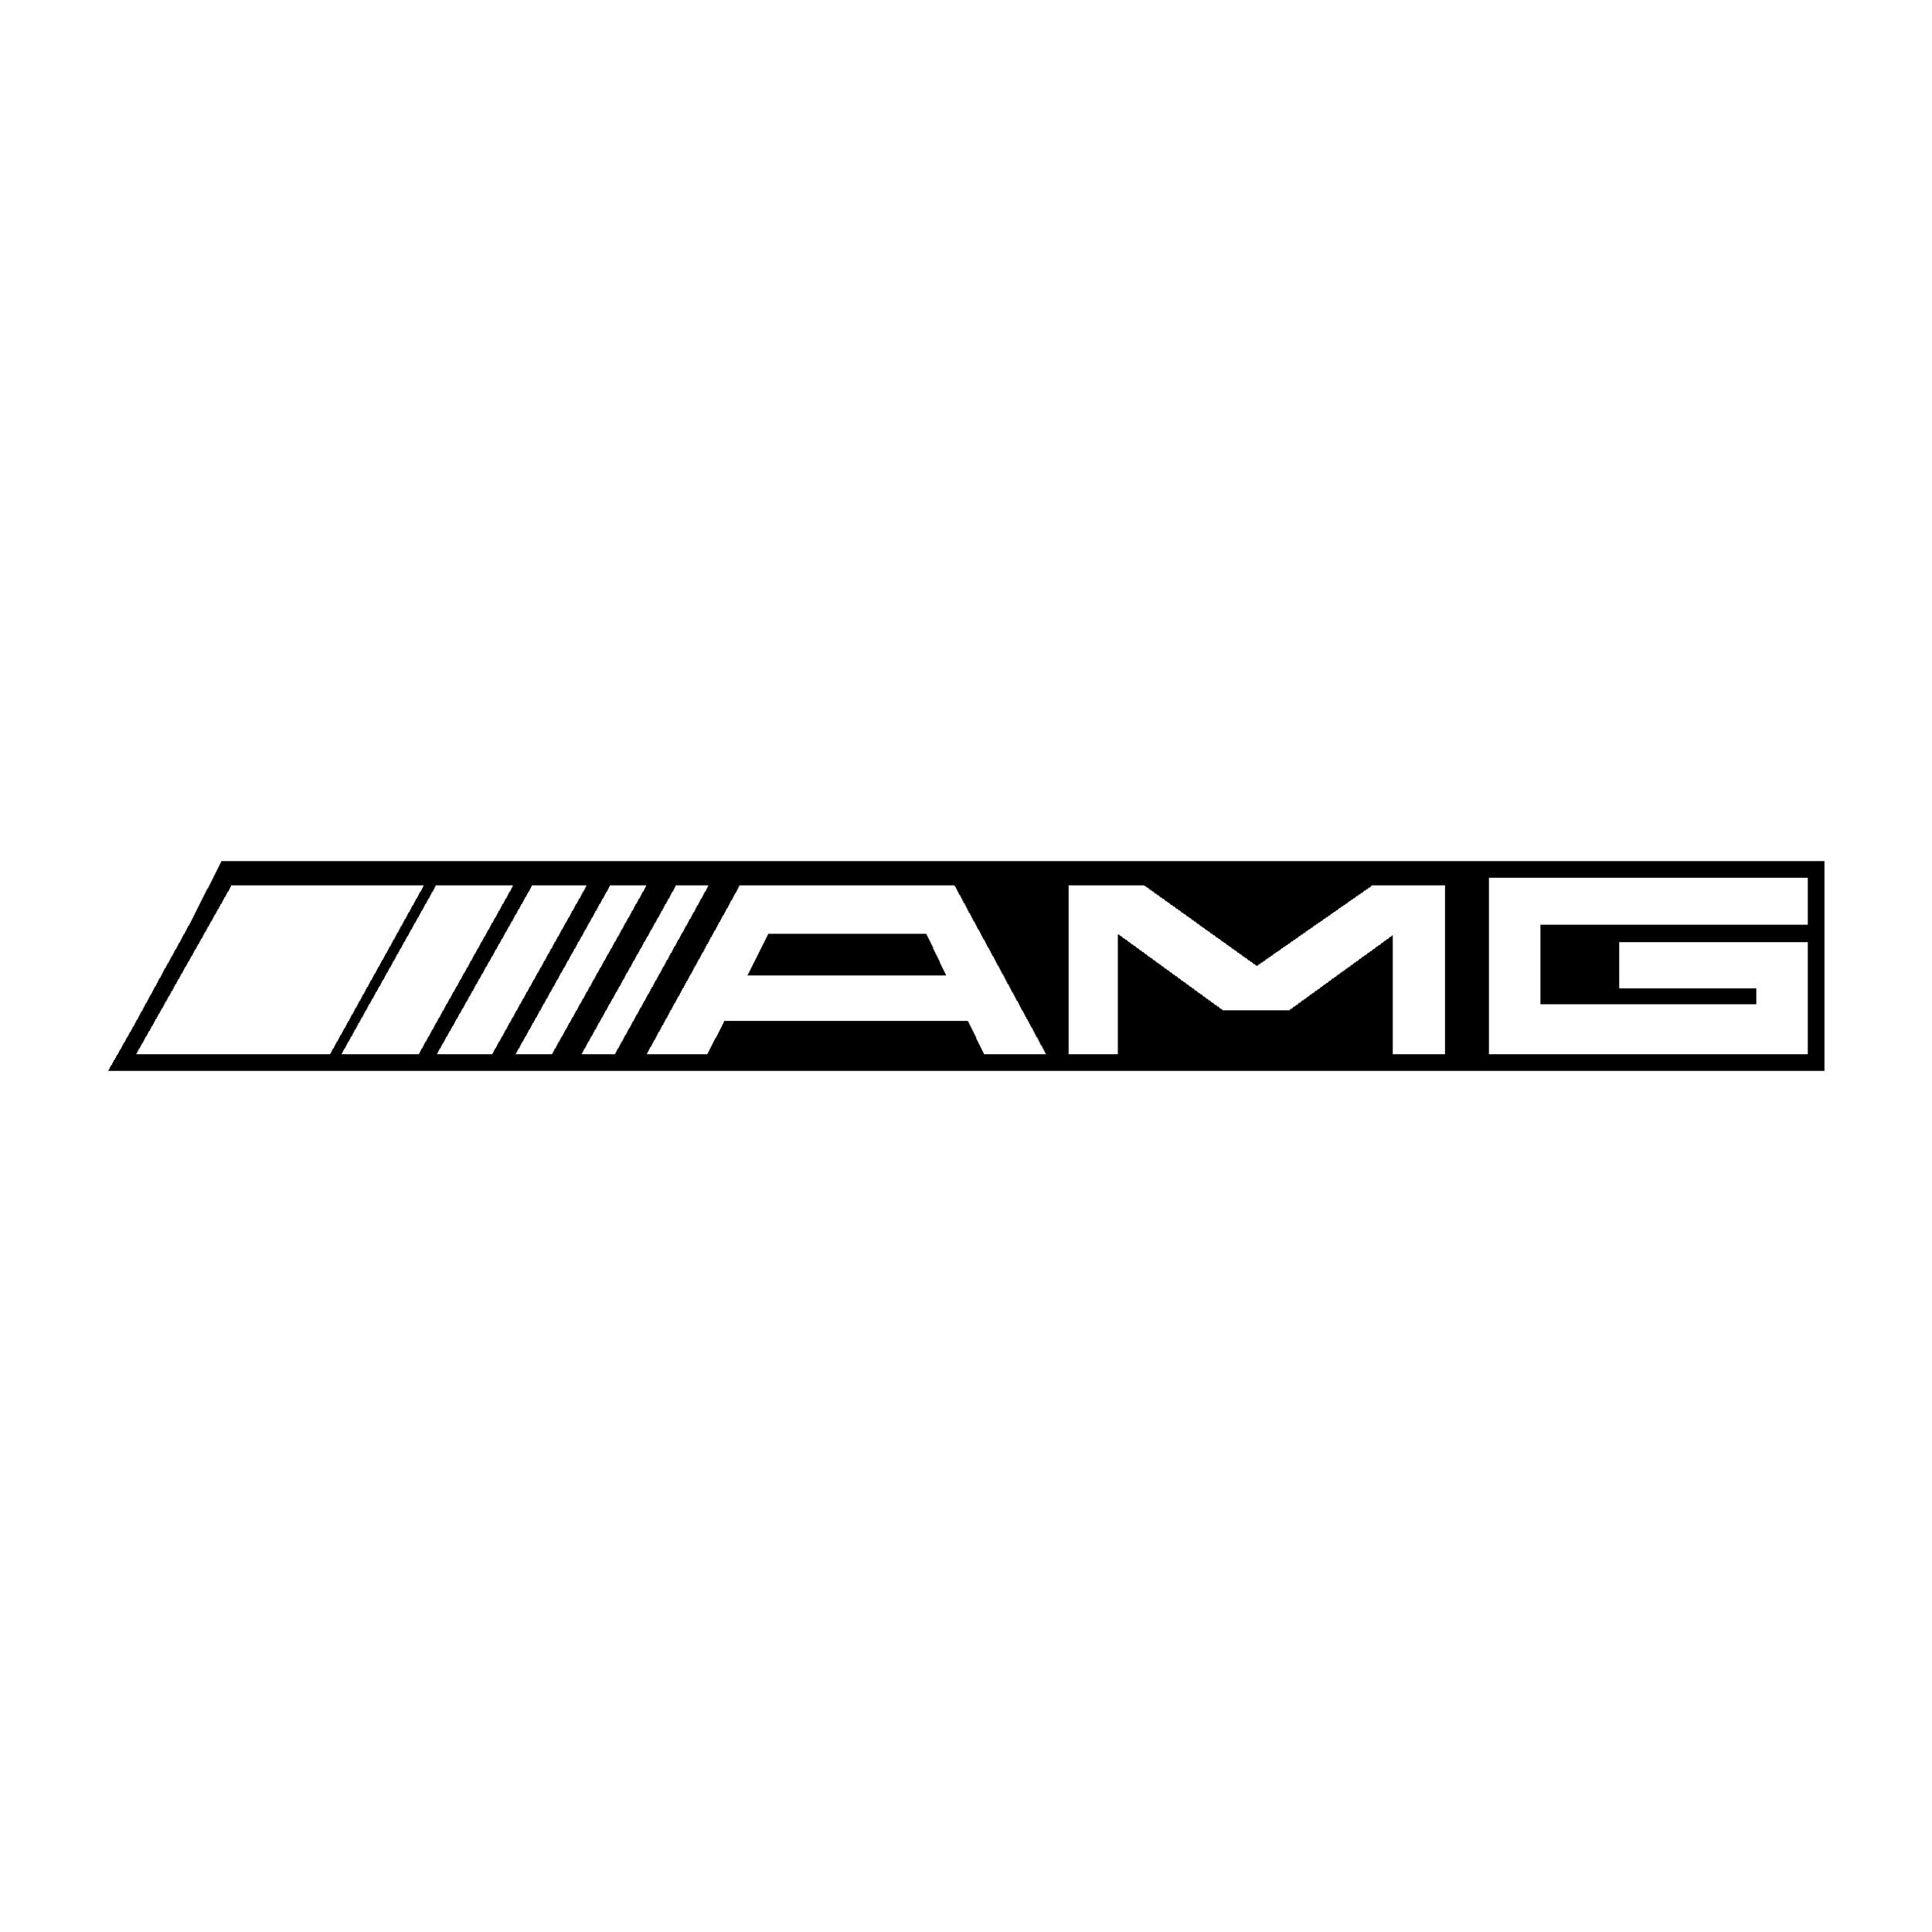 Stickers Amg Contours Sponsors Premstick